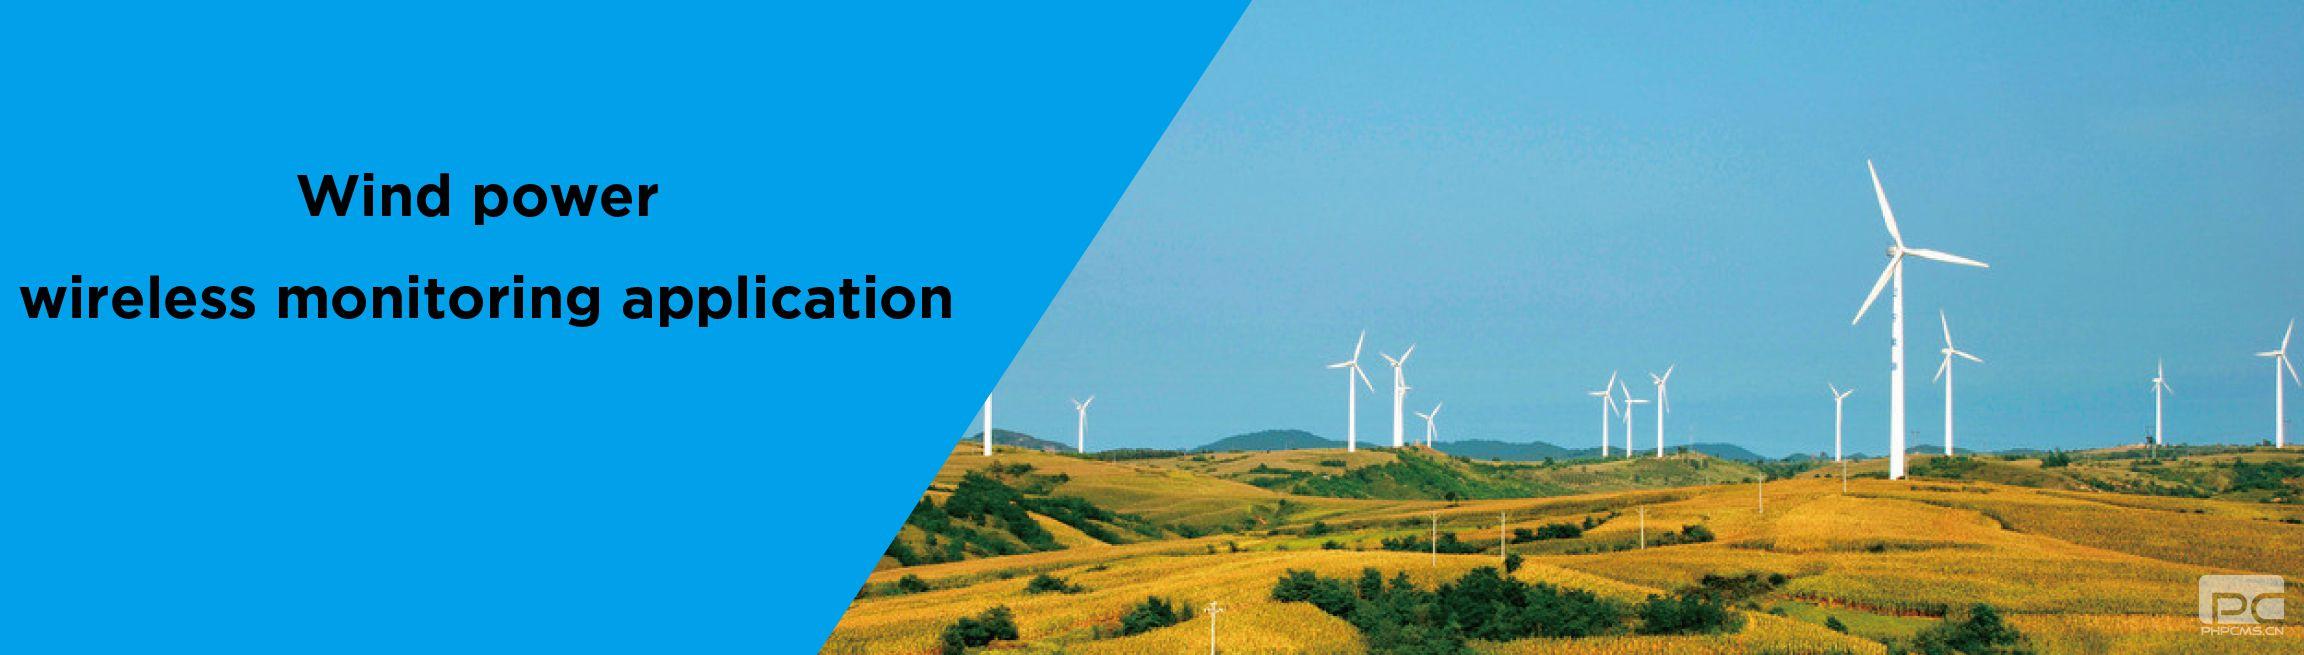 Wind power wireless monitoring application